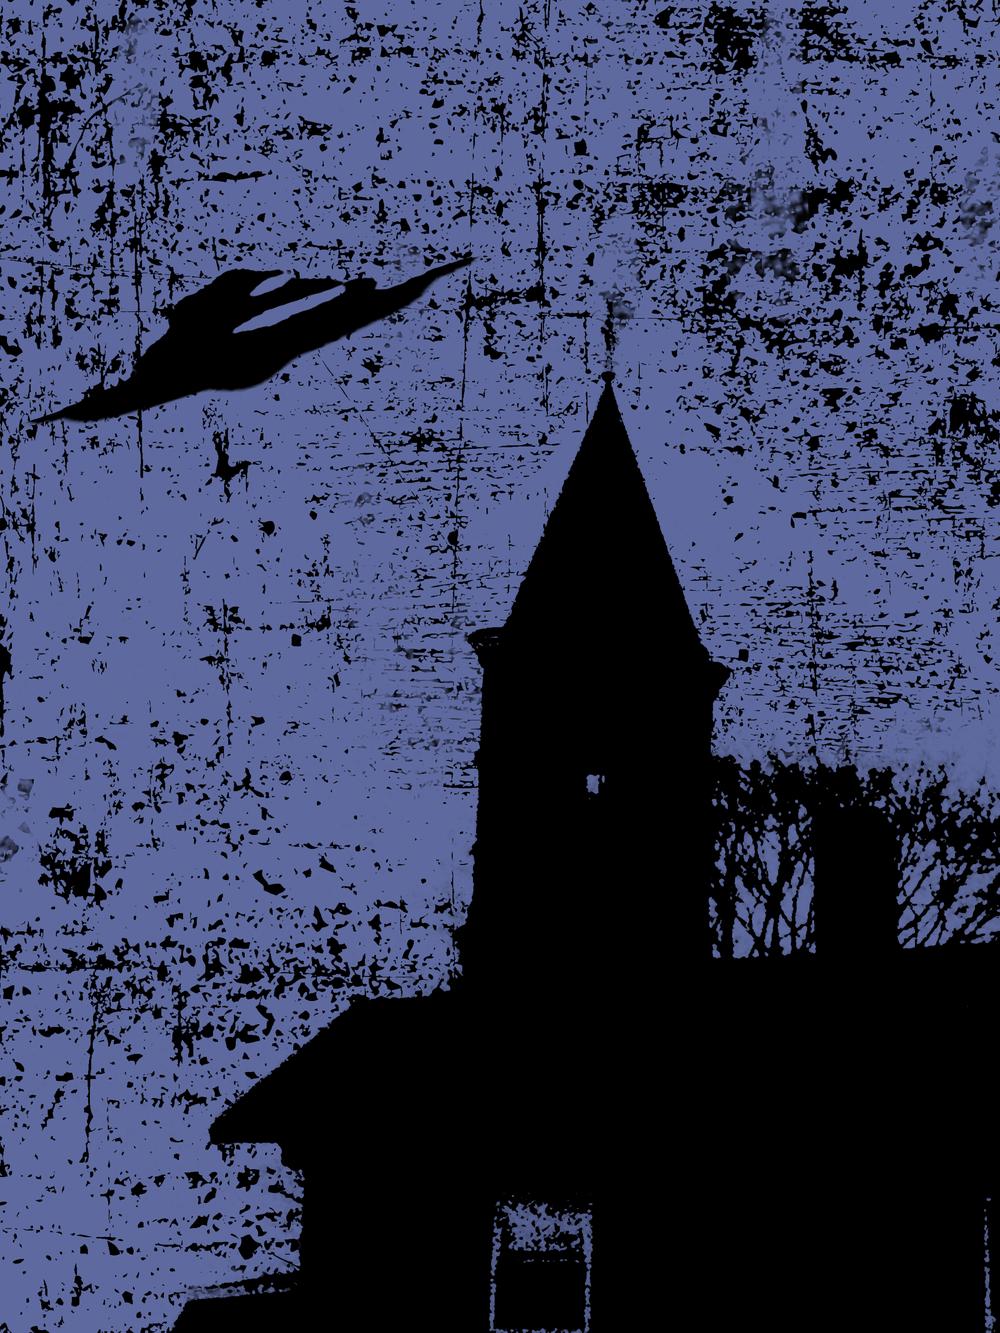 sad church 10x13.3.png